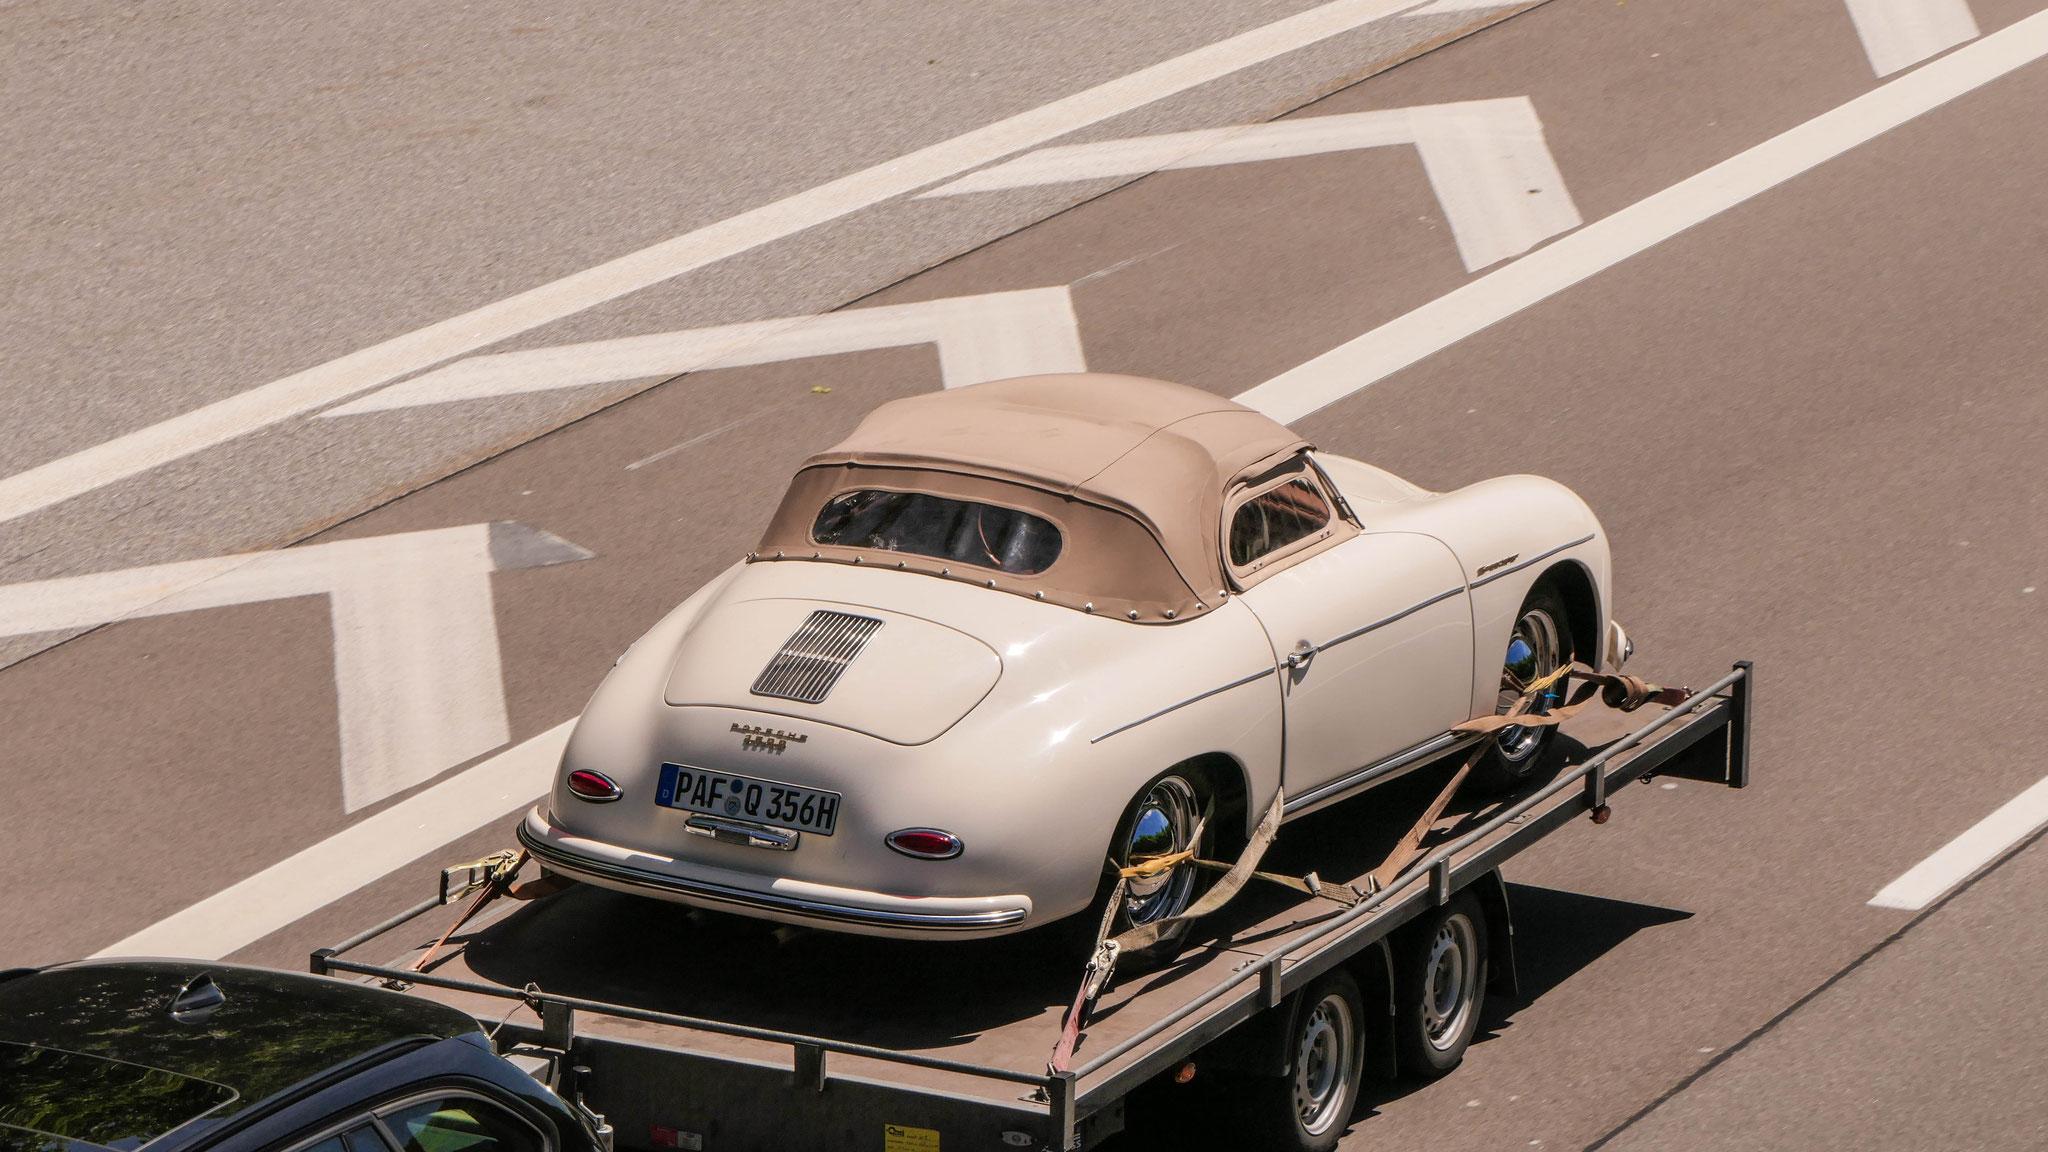 Porsche 356 1600 Super - PAF-Q-356H